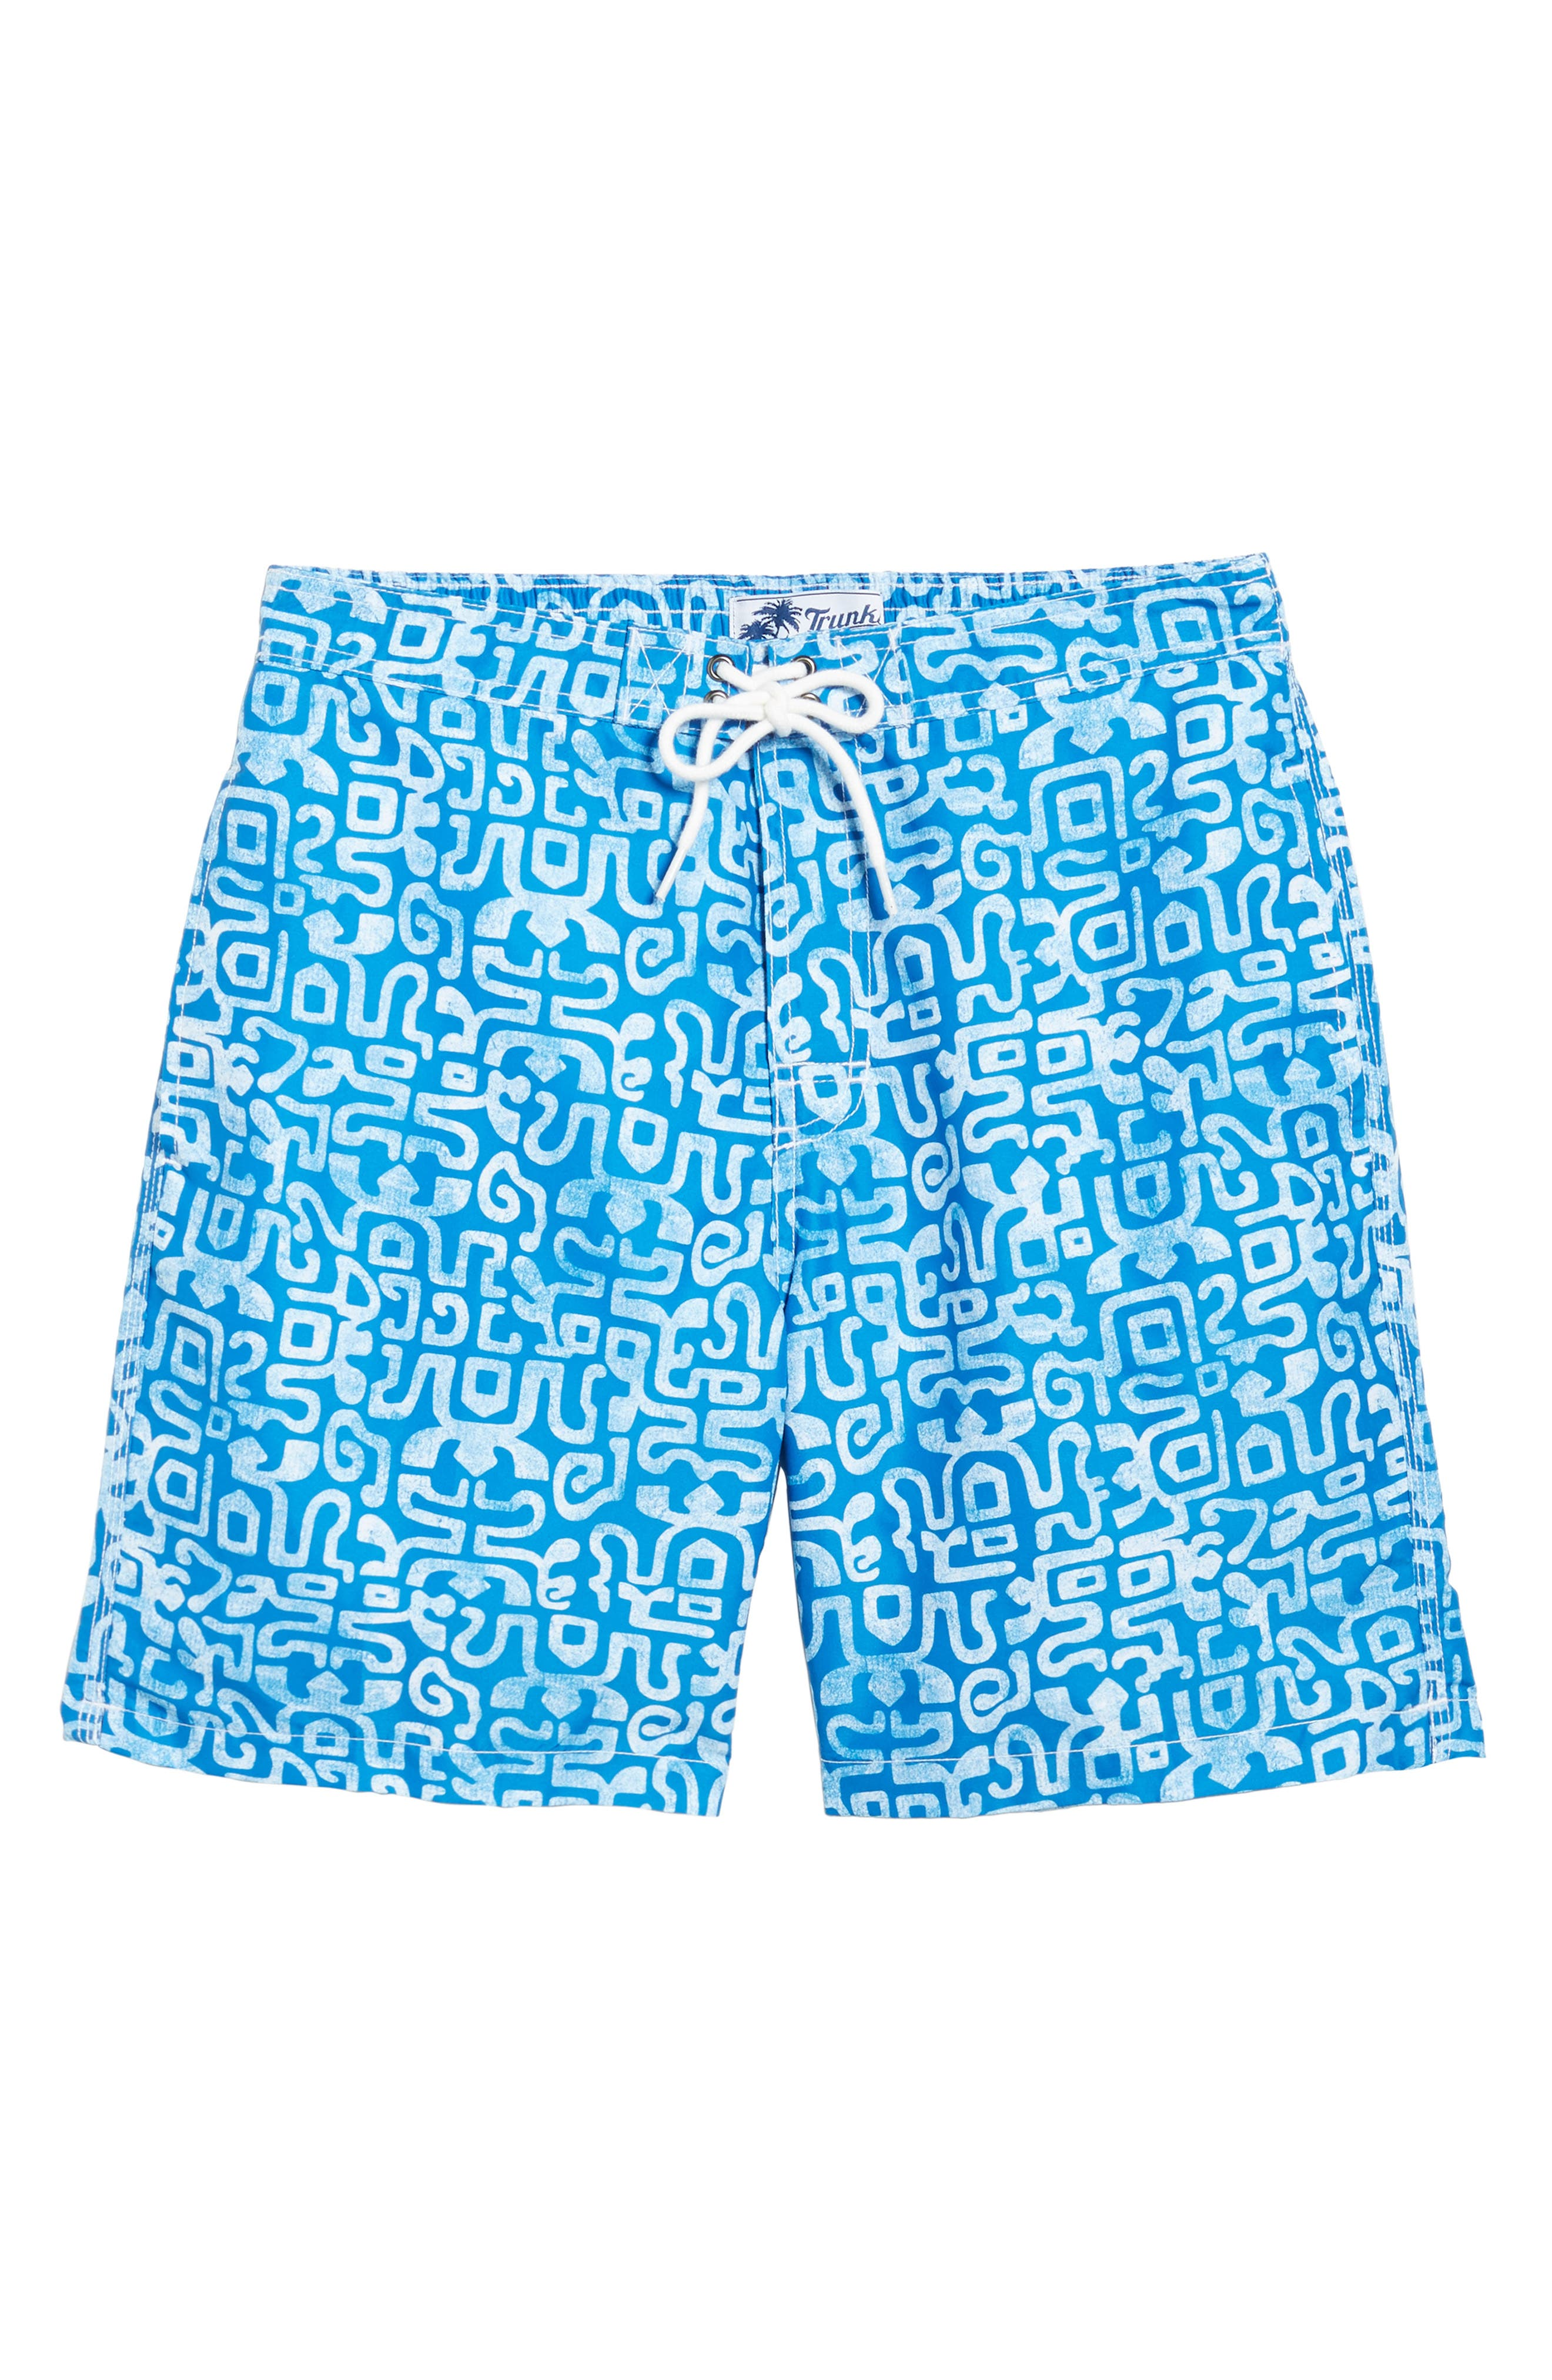 Trunks Swim & Surf CO. Swami Geo Print Board Shorts,                             Alternate thumbnail 6, color,                             416